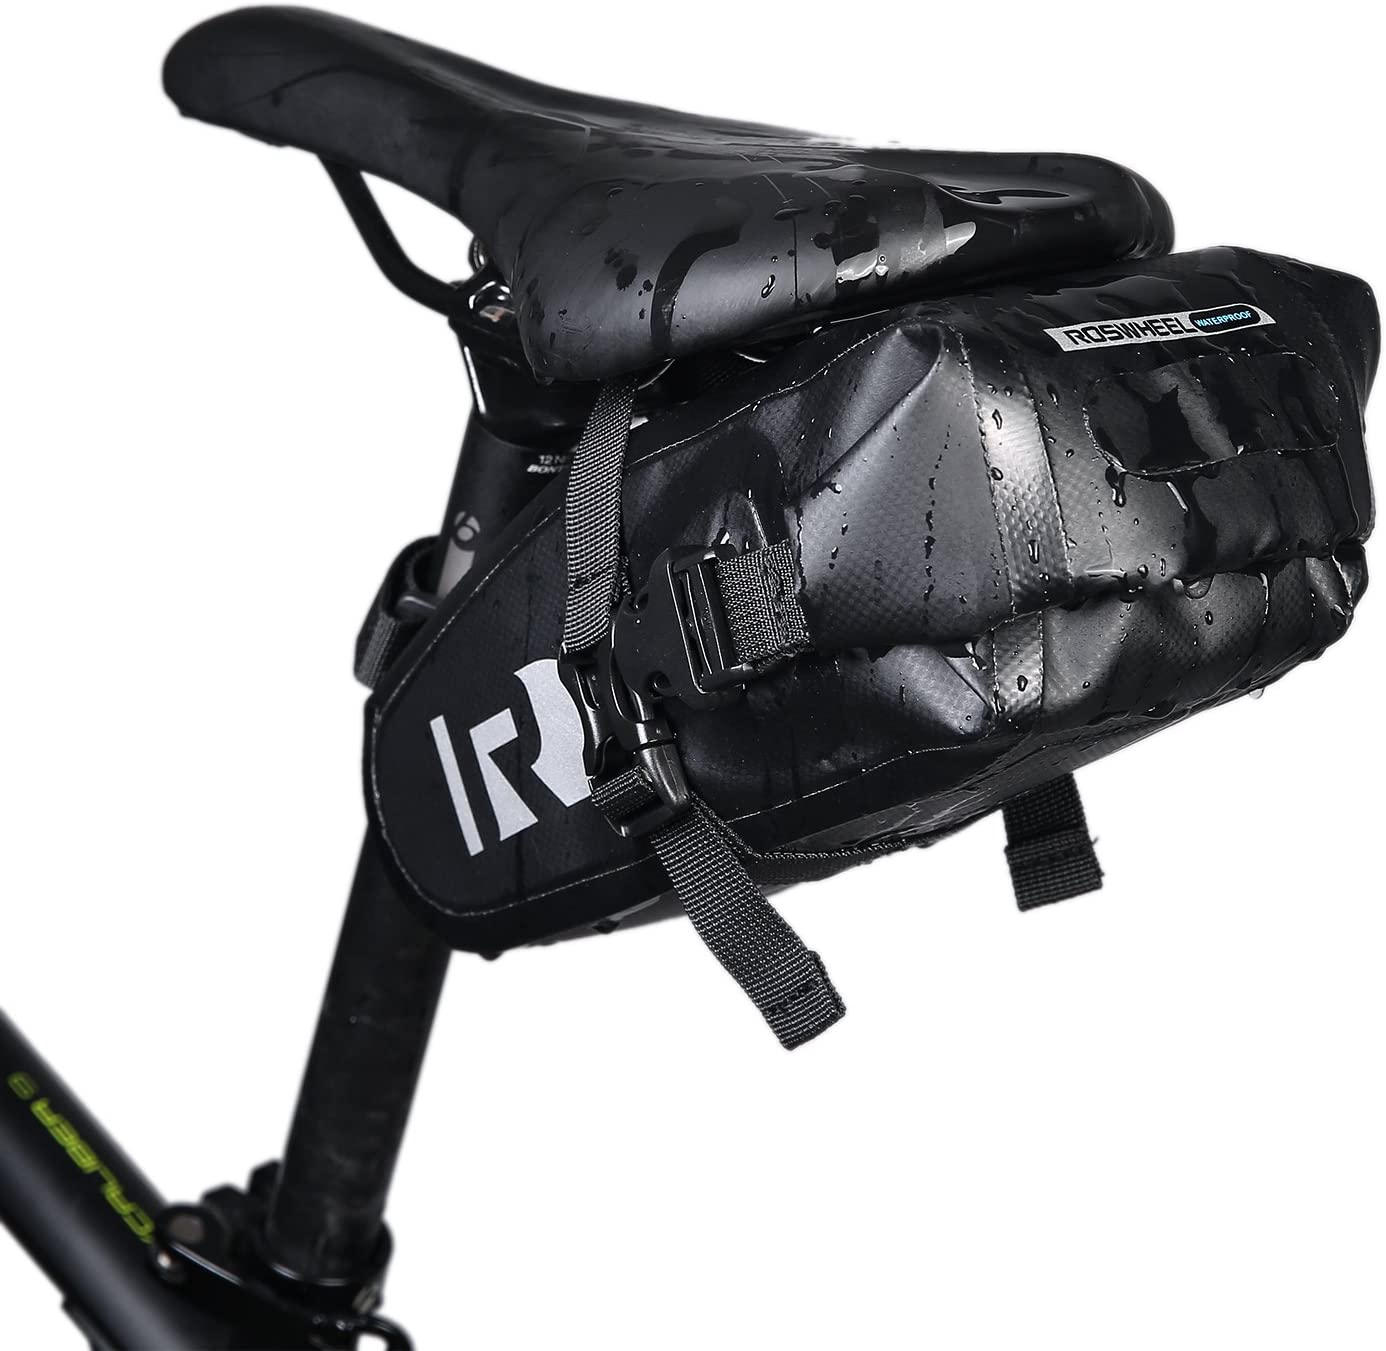 ROCKBROS Bicycle Saddle Bag Cycling Under Seat Bike Waterproof Seatpost Red Bag